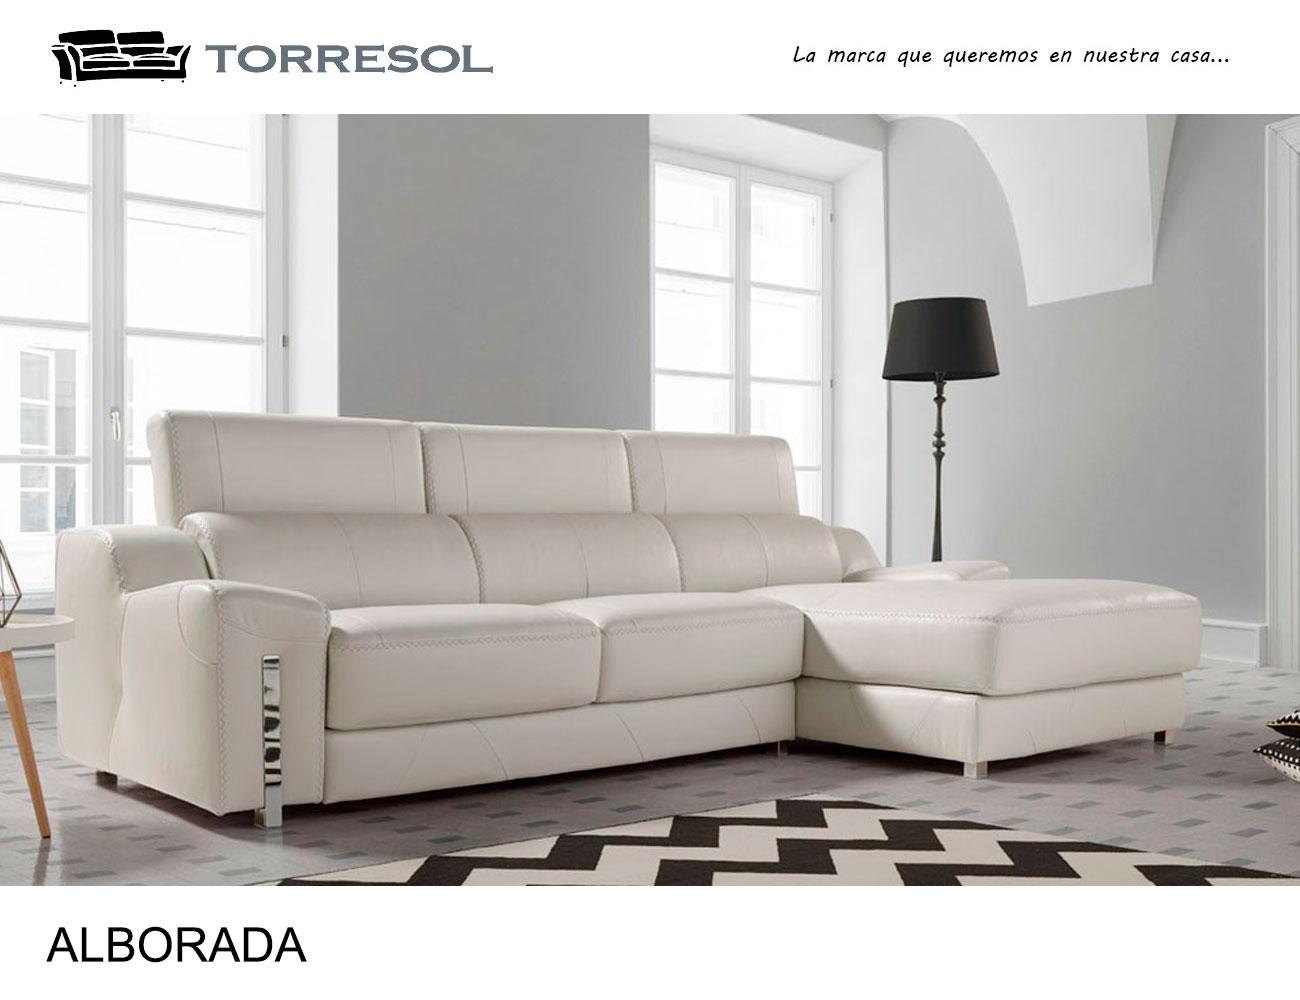 Sofa alborada torresol